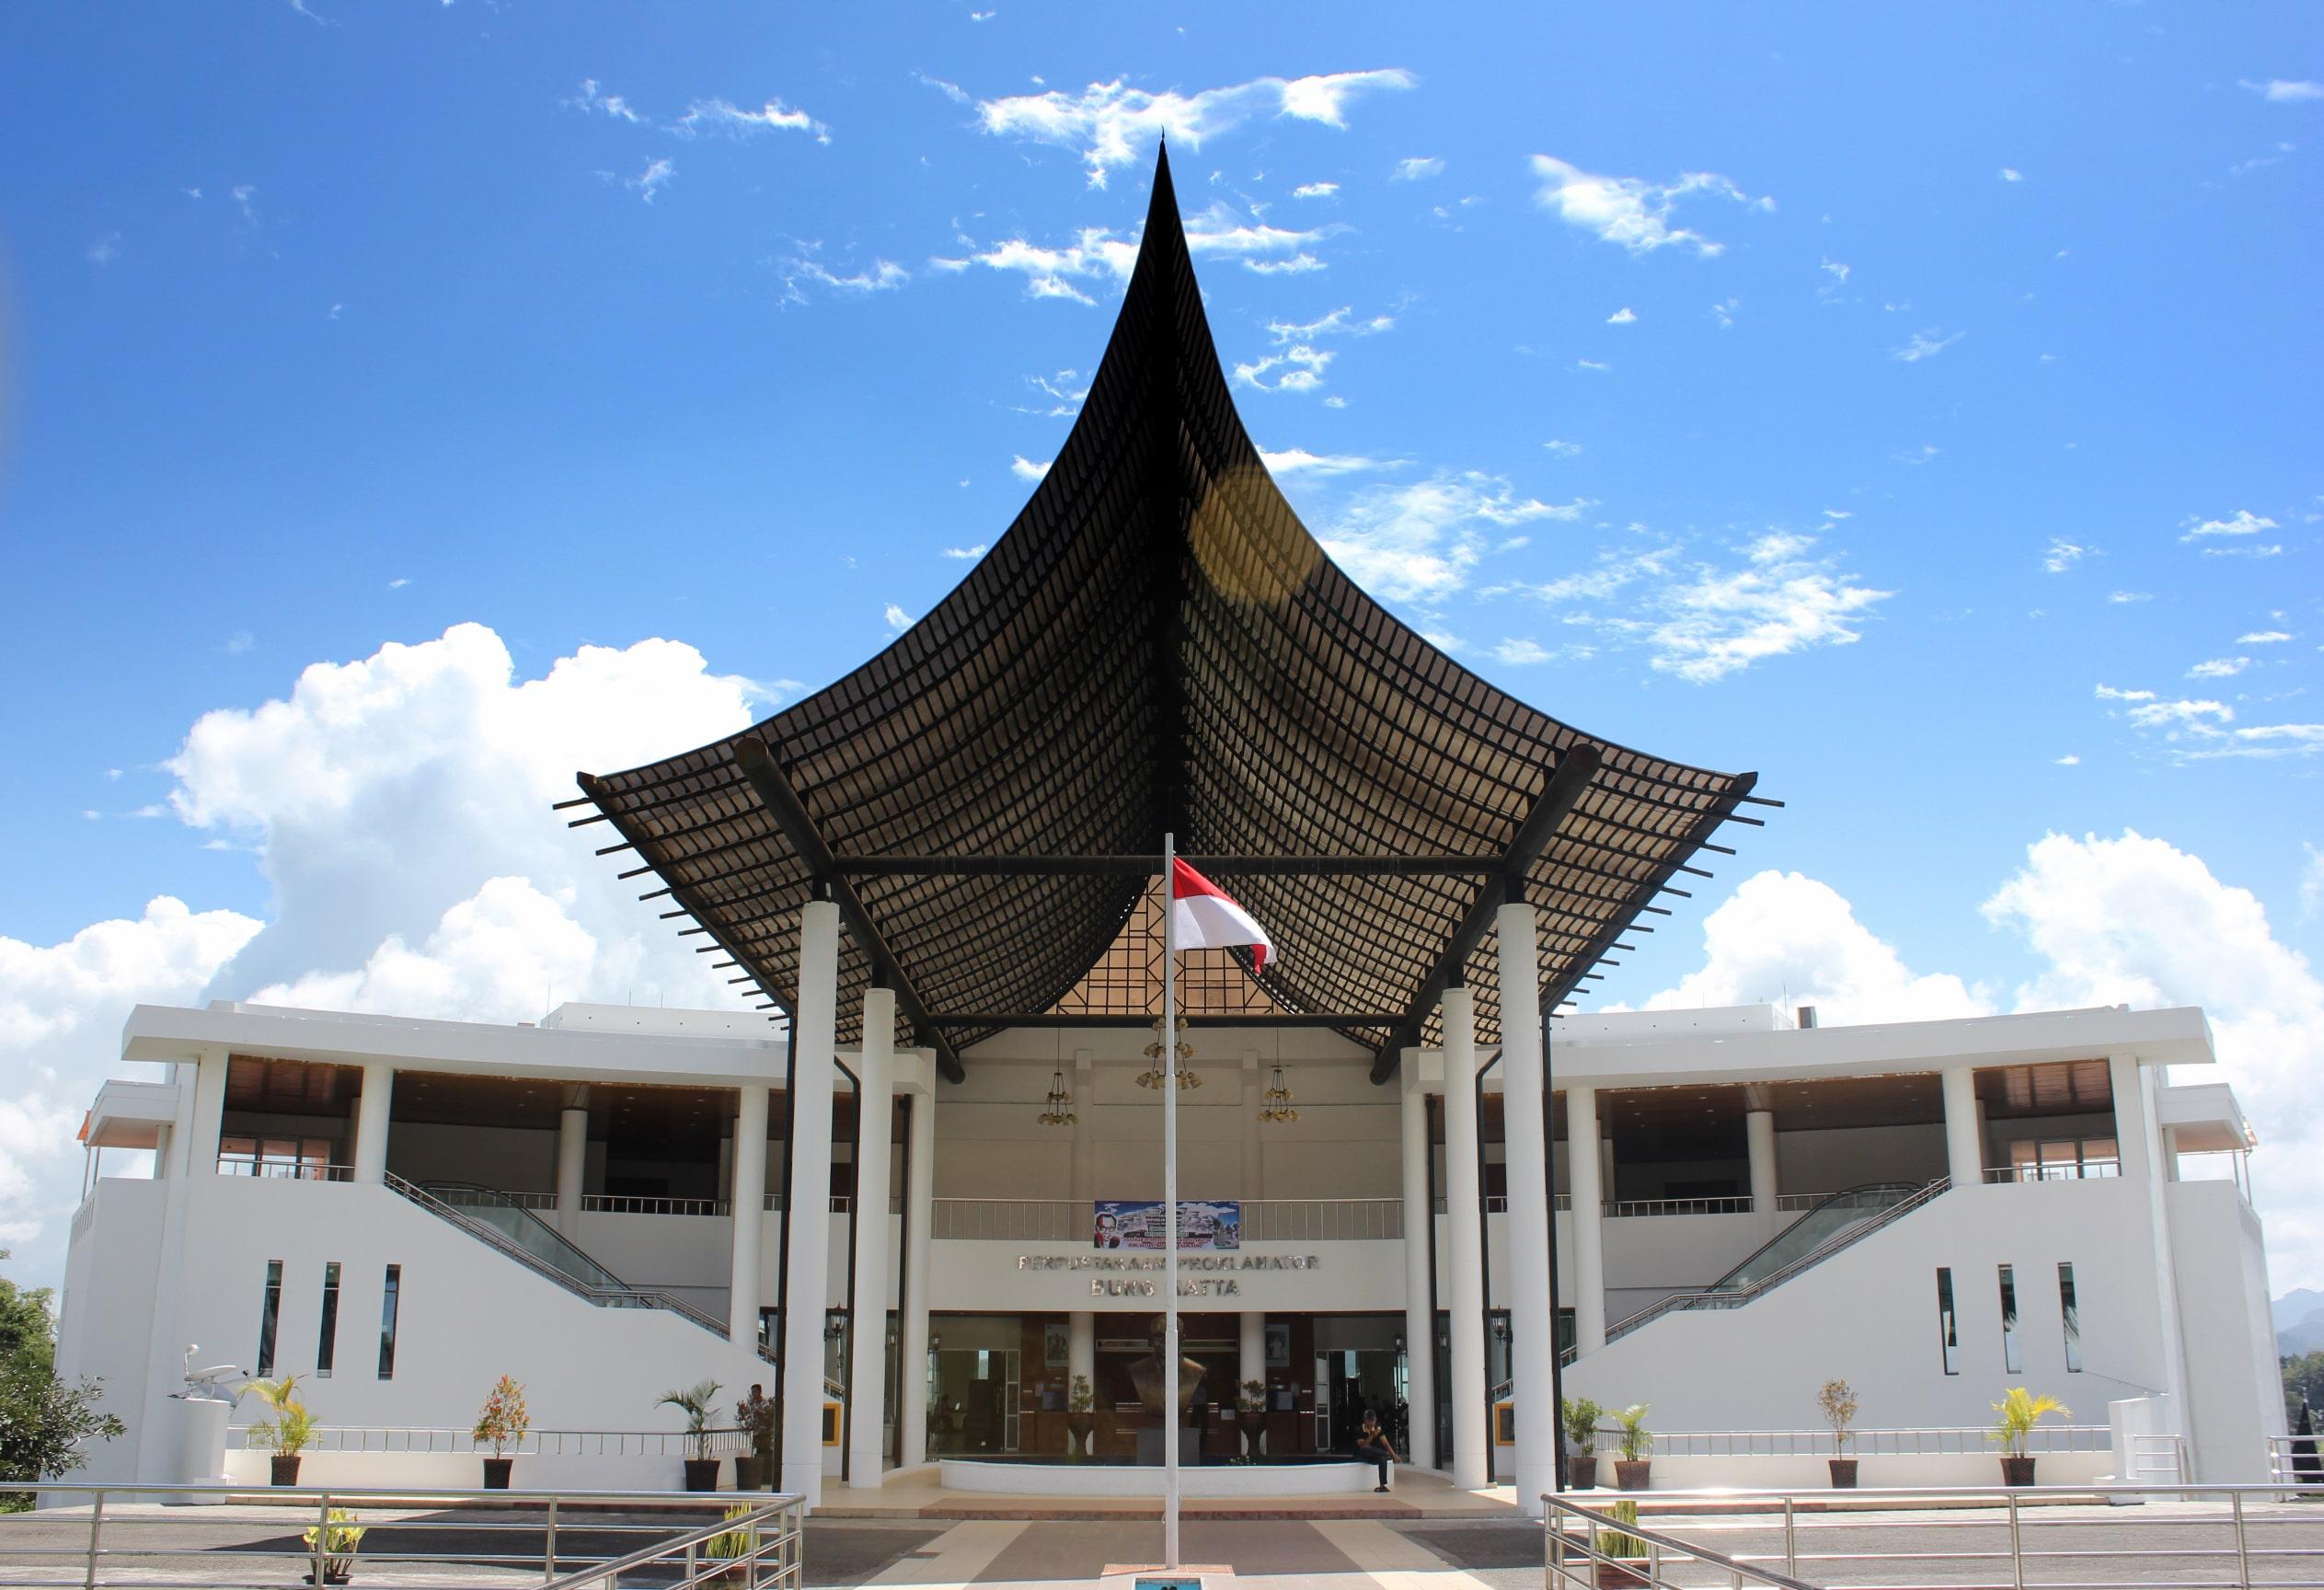 Perpustakaan Proklamator Bung Hatta © dokumentasi pribadi